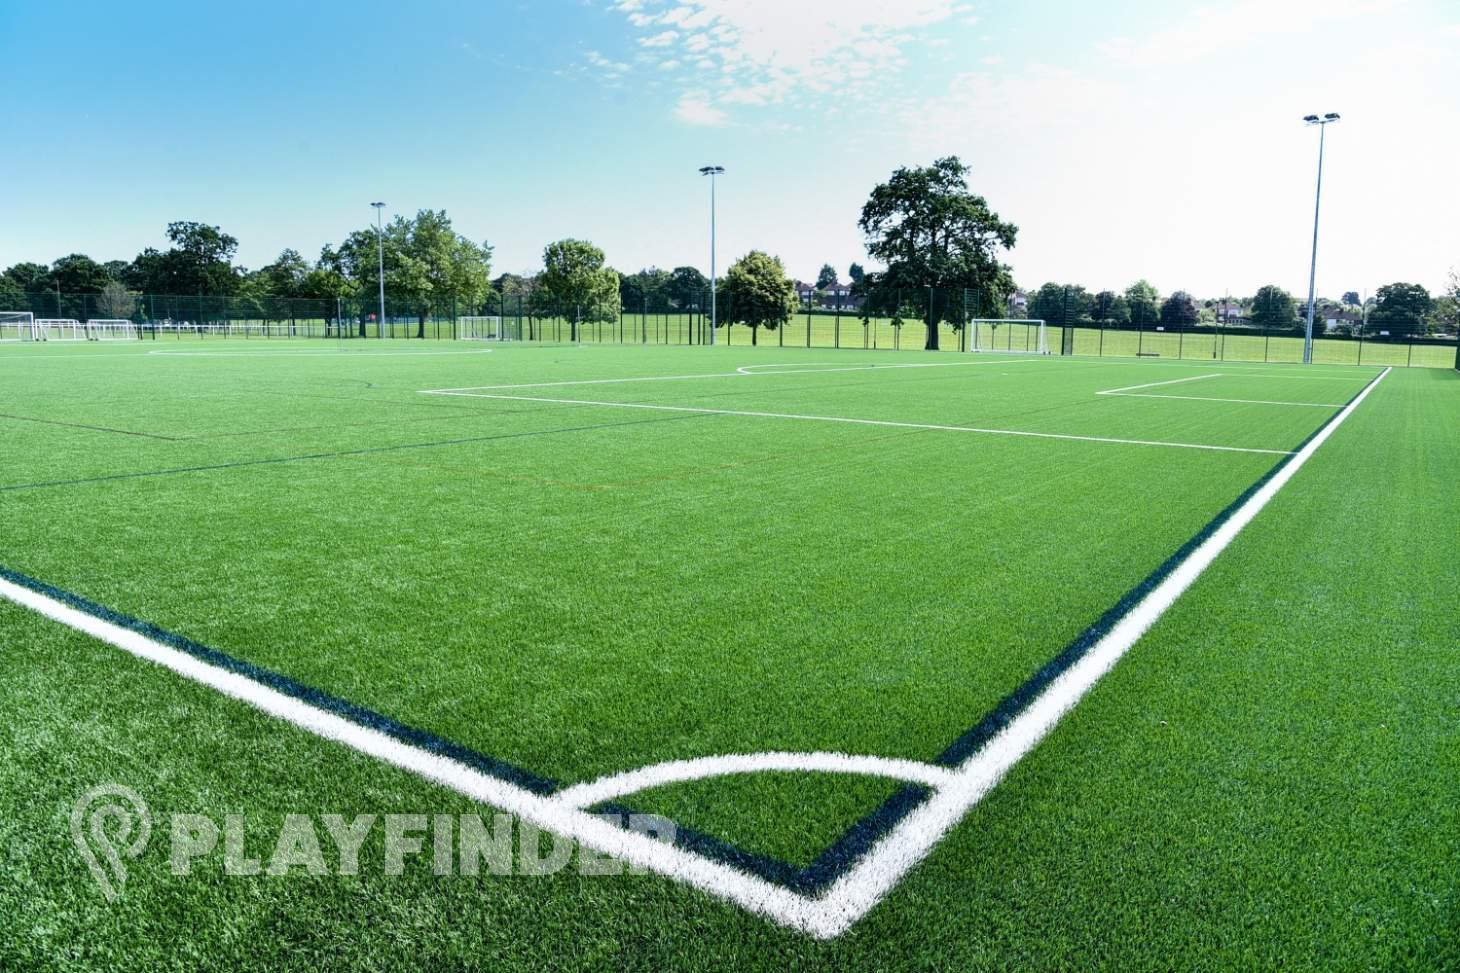 Barnet Lane 3G Pitch 7 a side | 3G Astroturf football pitch